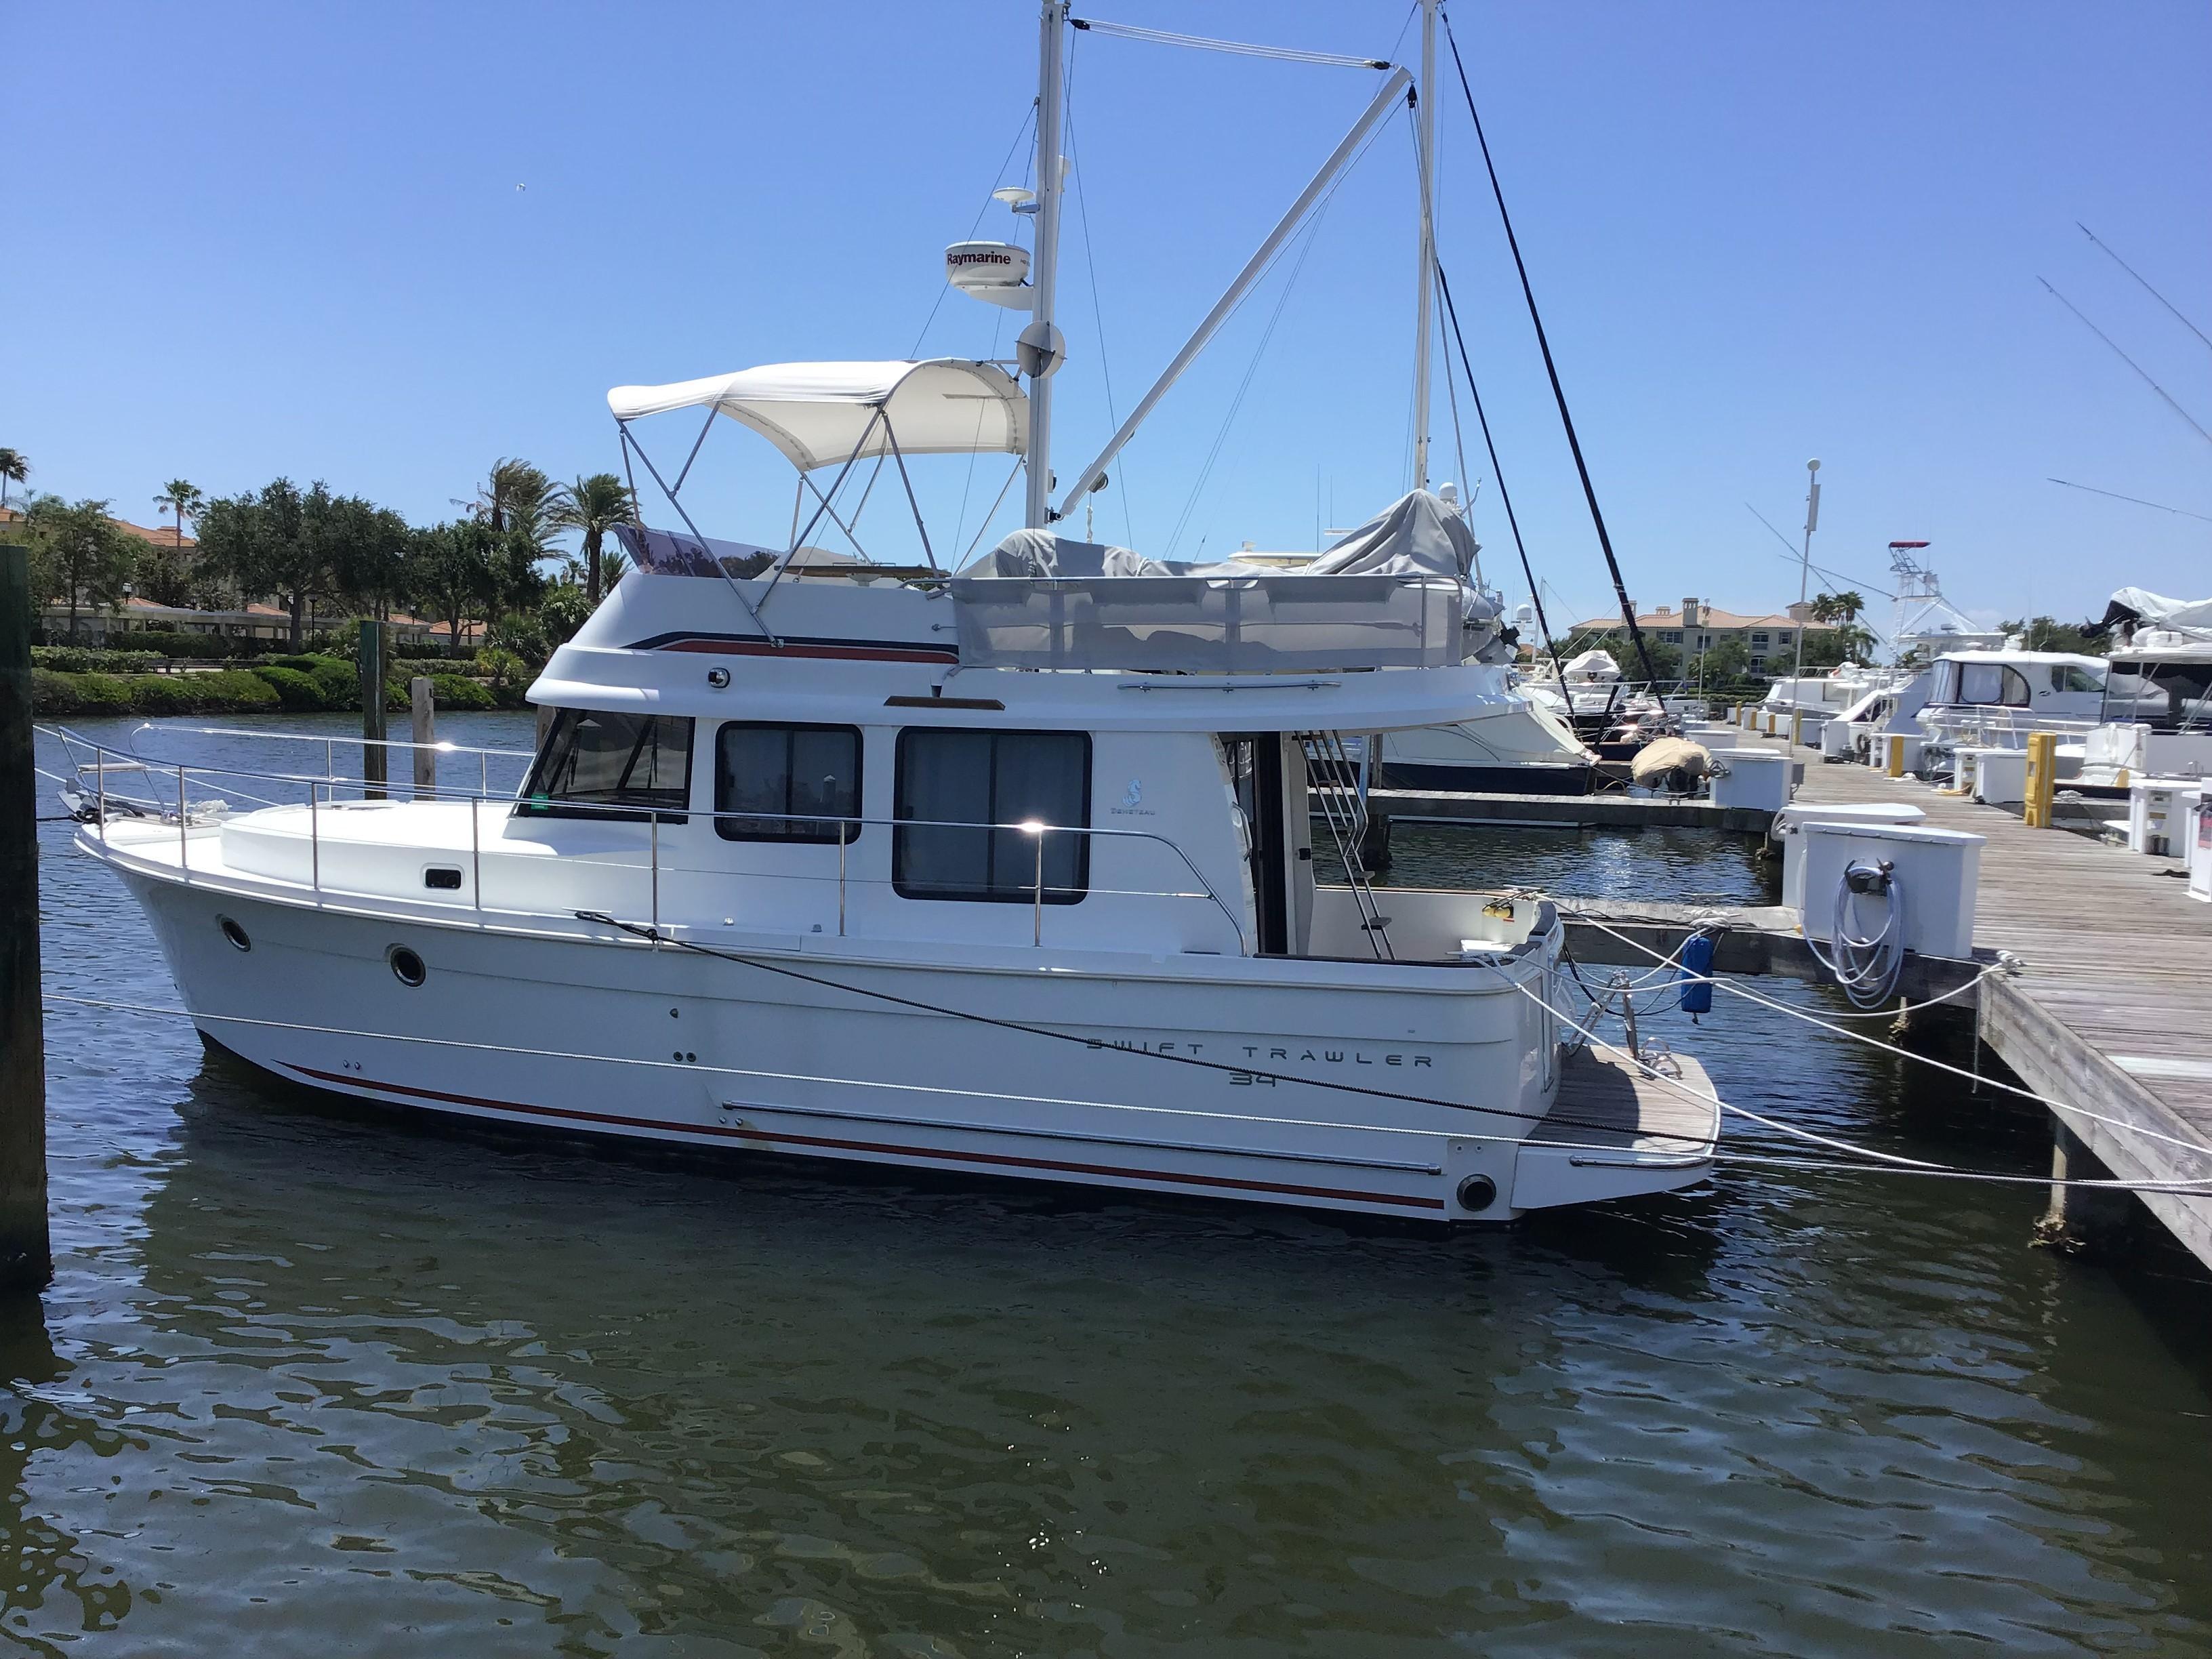 2014 Beneteau Swift Trawler 34 Yacht For Sale In Vero Beach Fl New Horizons